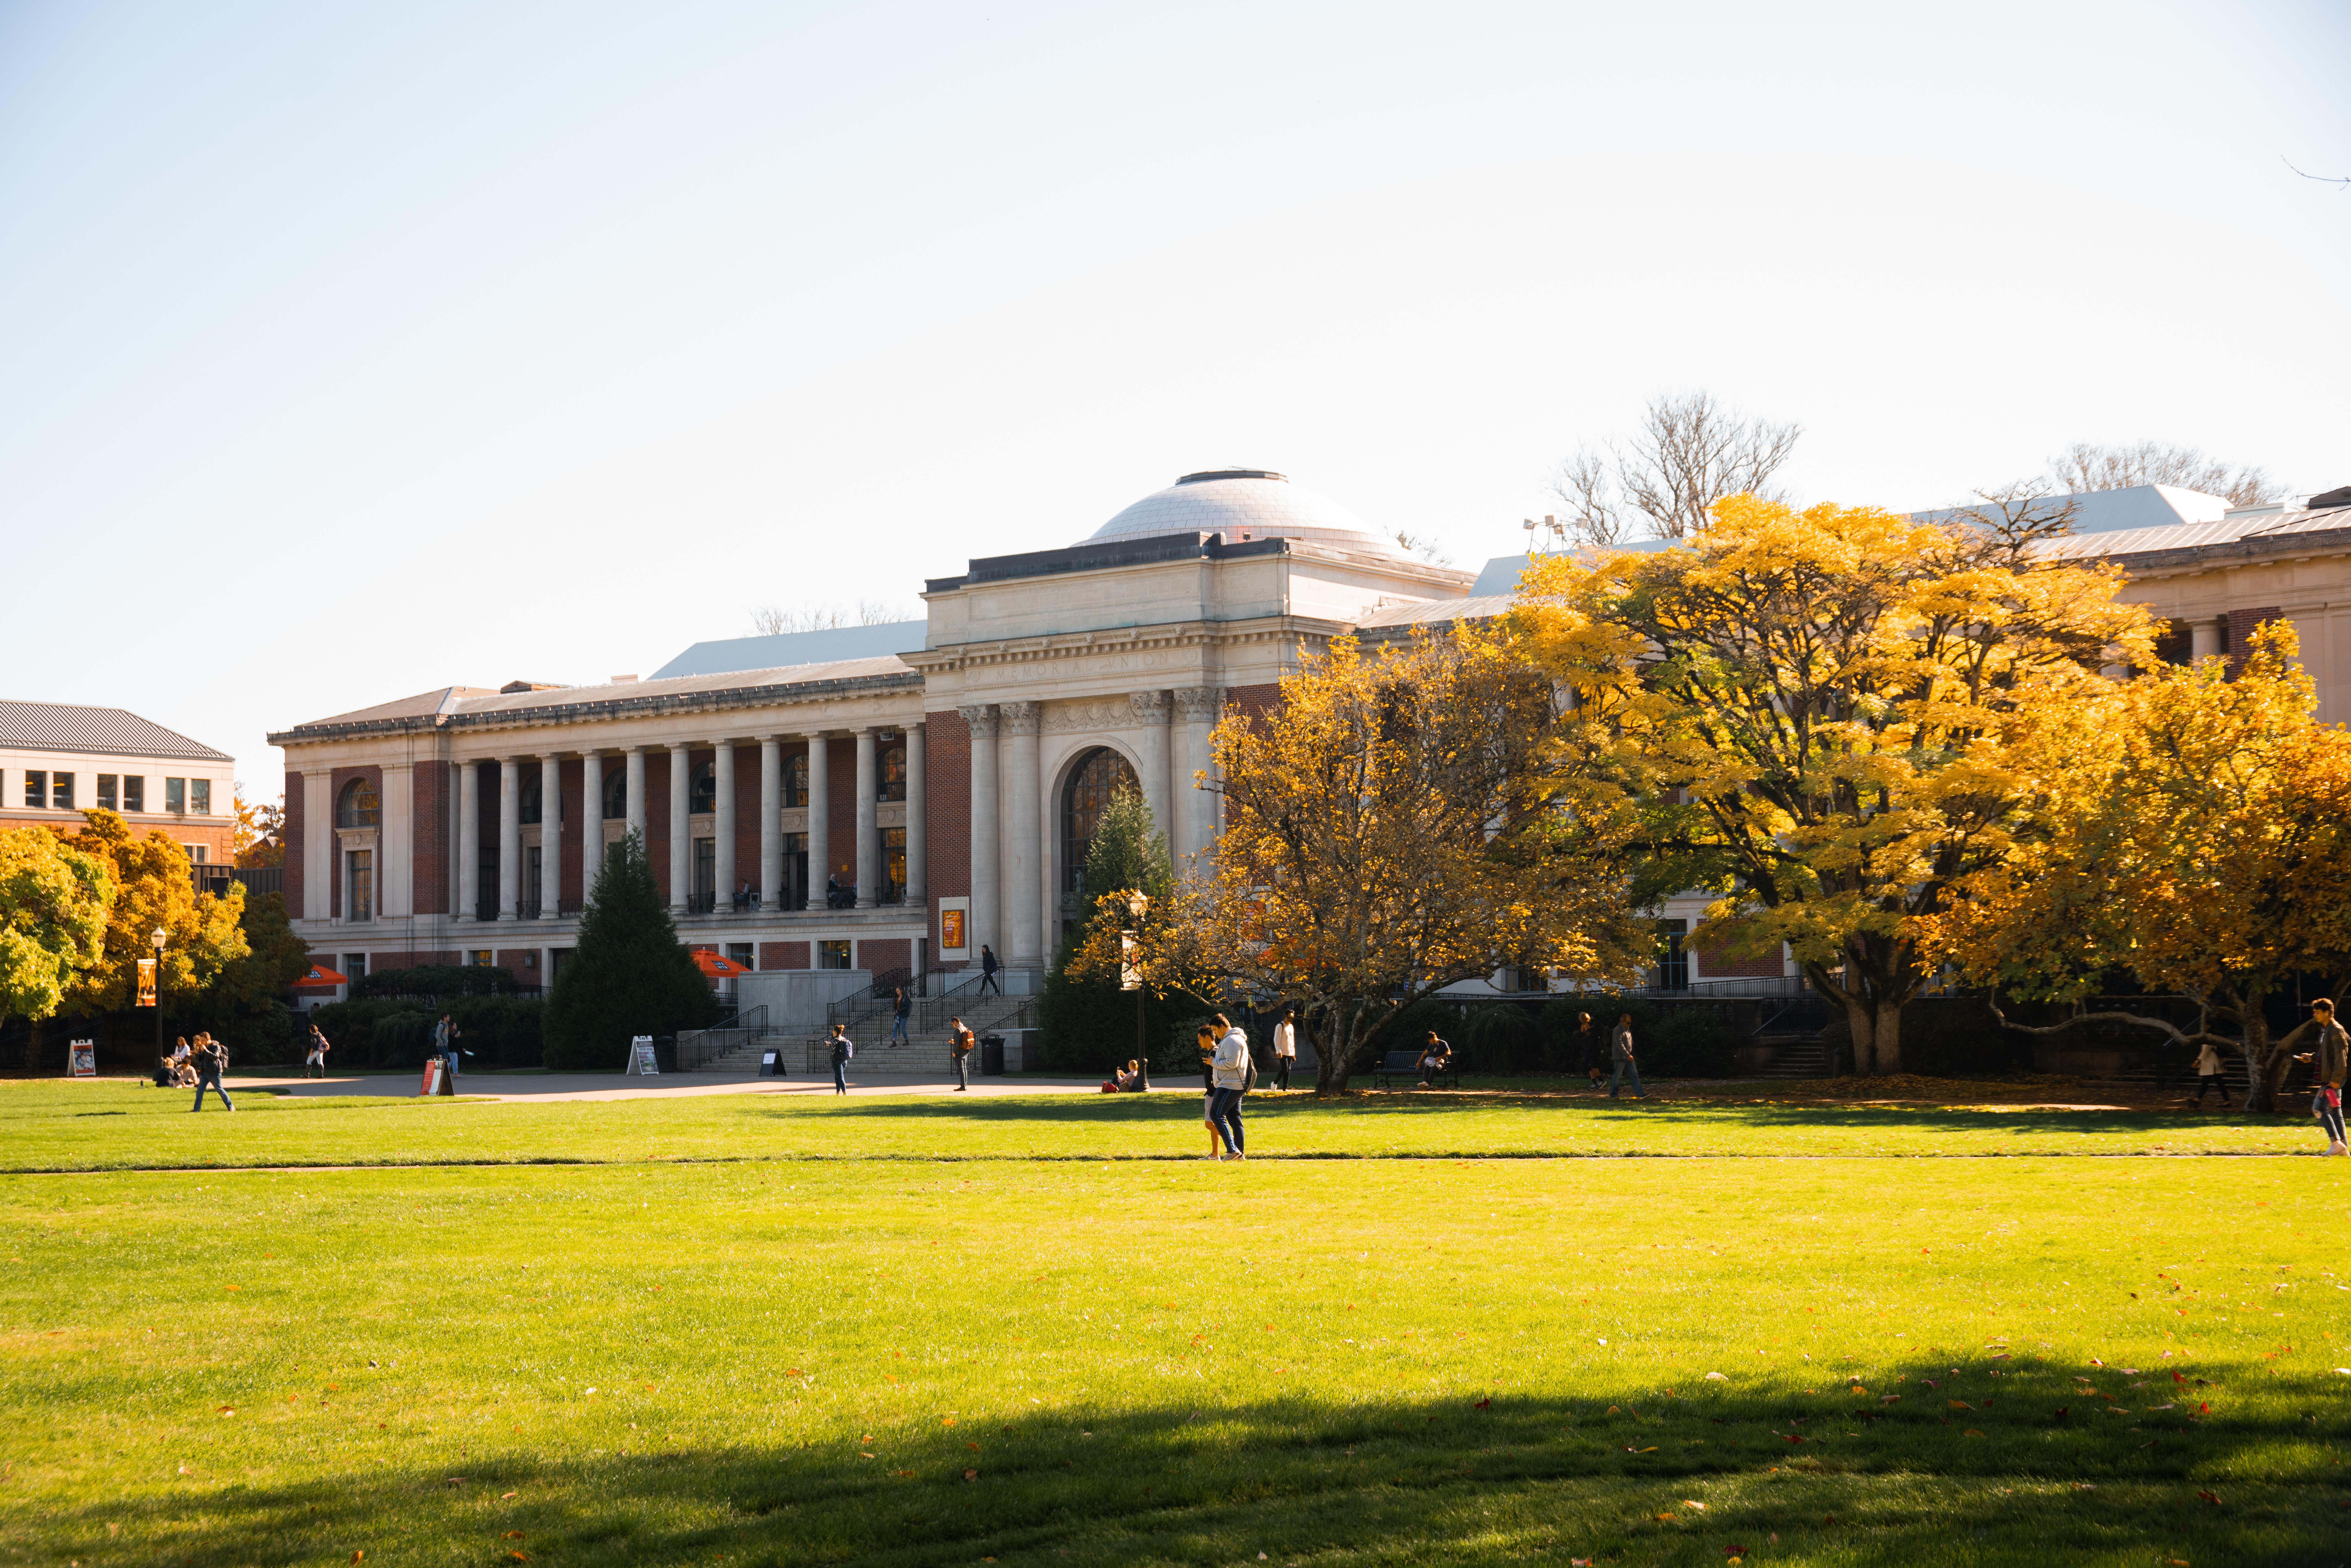 Photo of the Memorial Union Building & Qaud